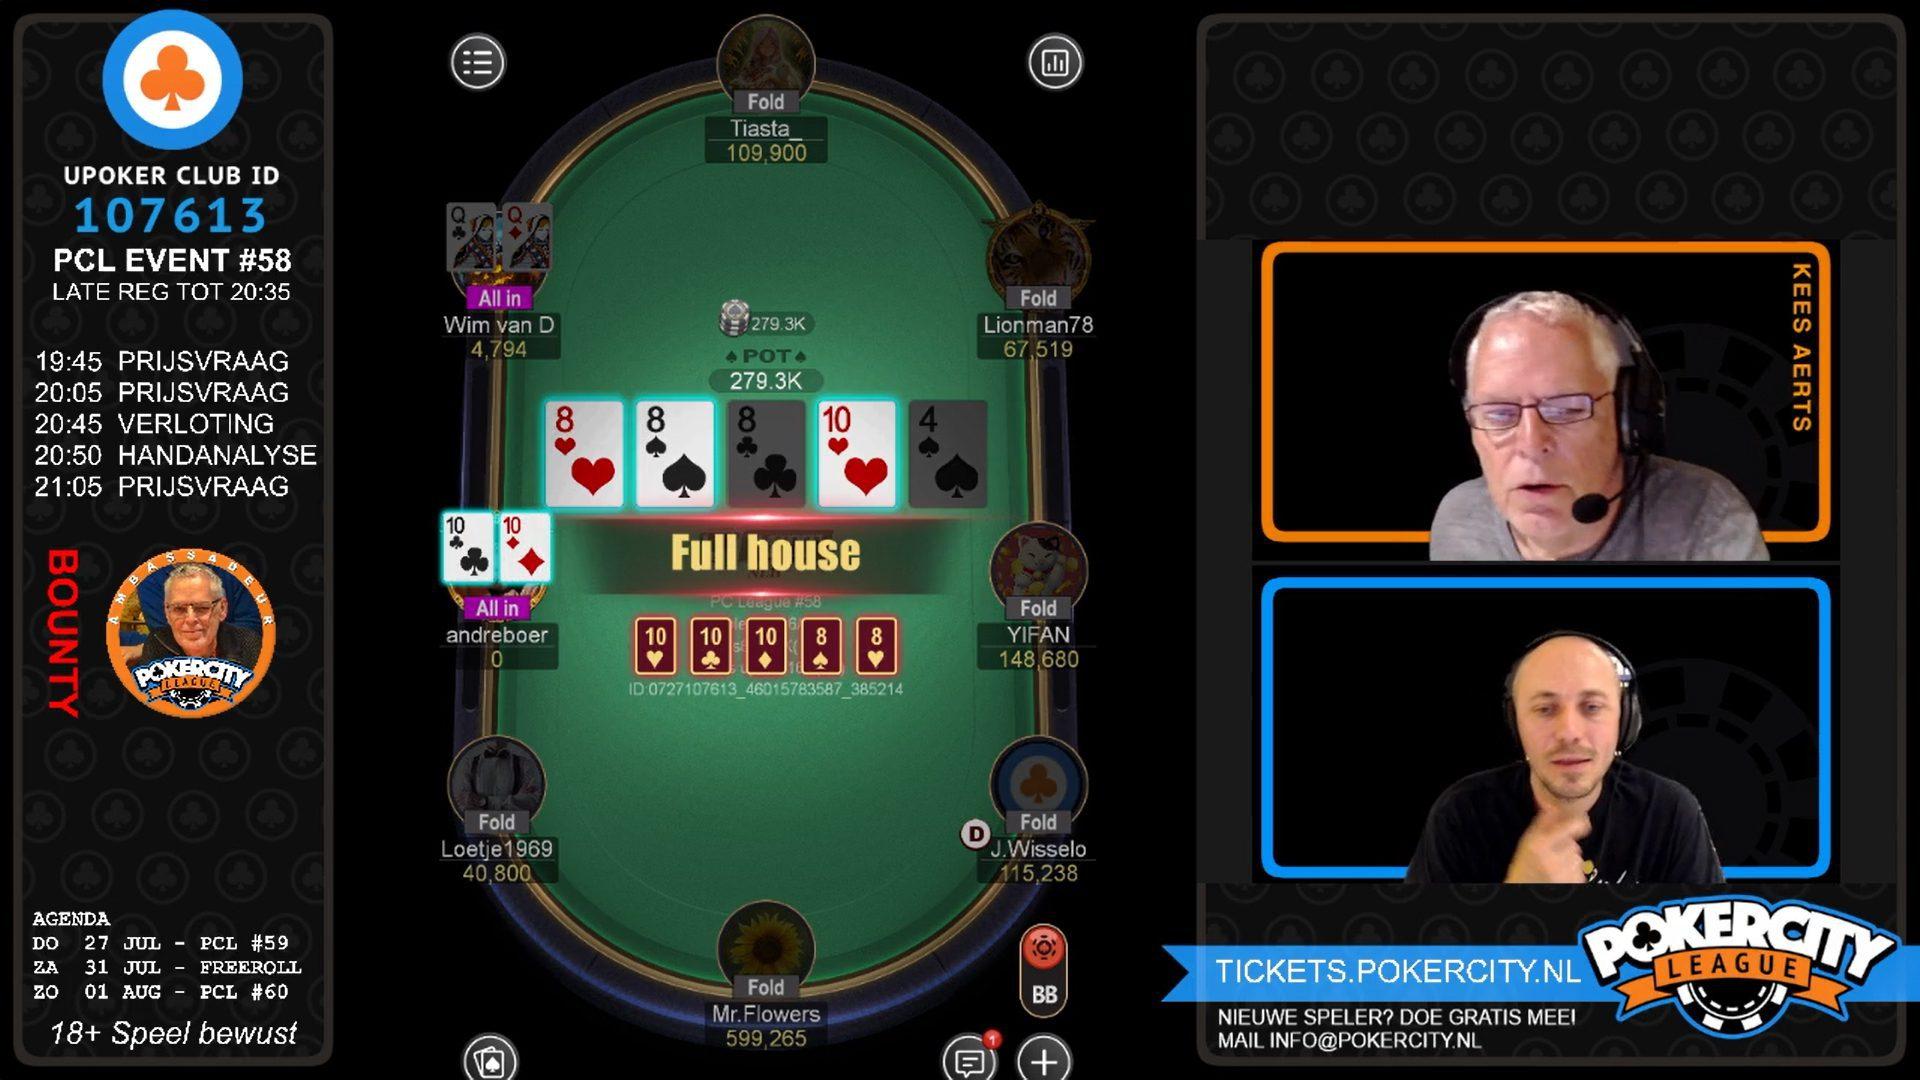 PokerCity League #58 - Wim van Dorsten Bubble